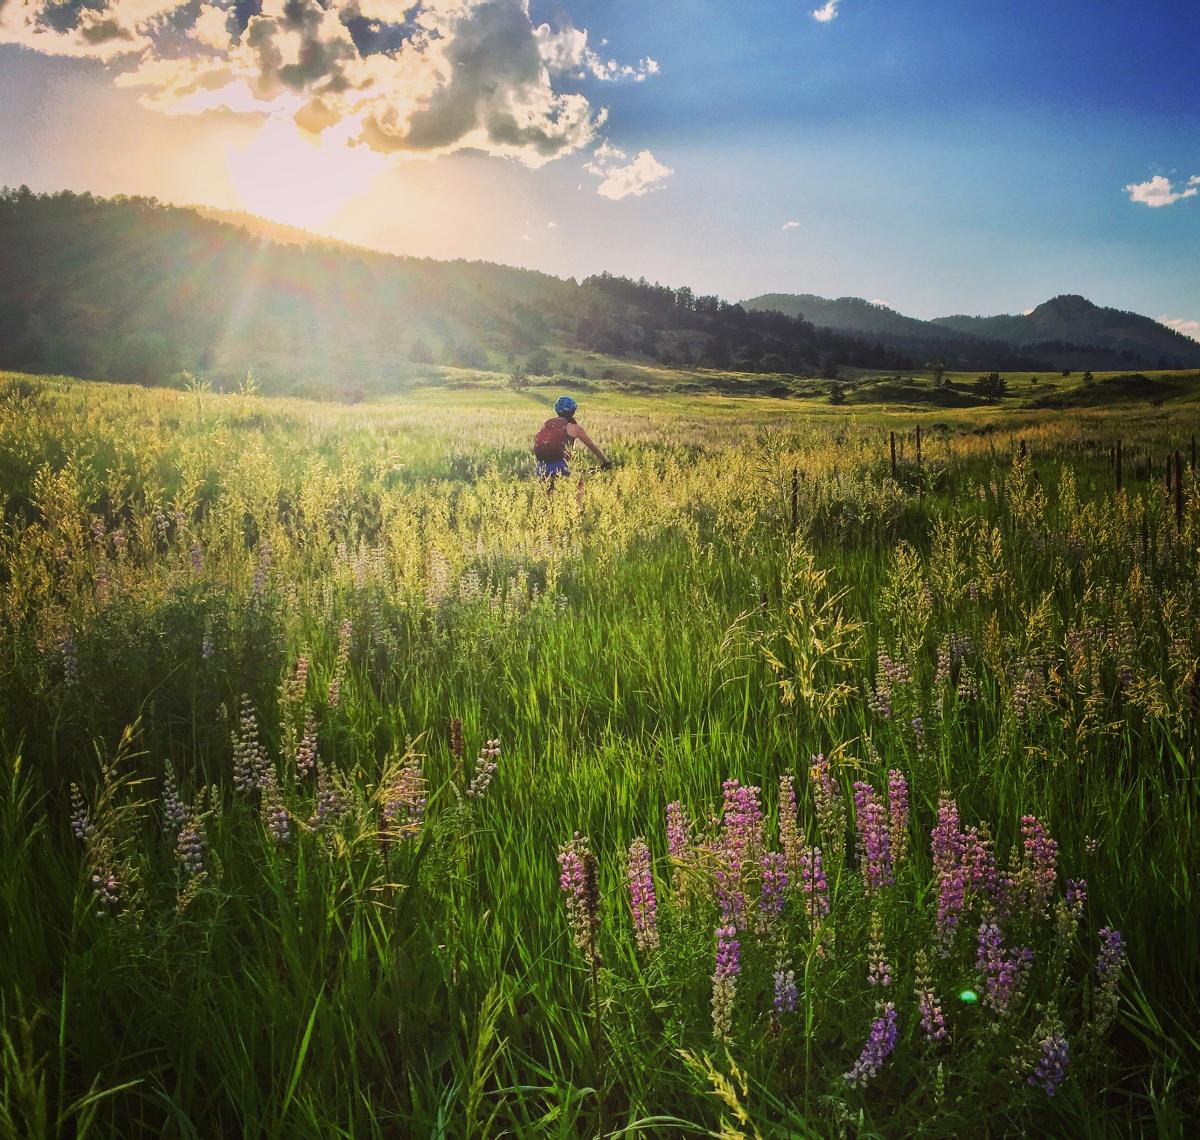 Mountain Biking in Fort Collins